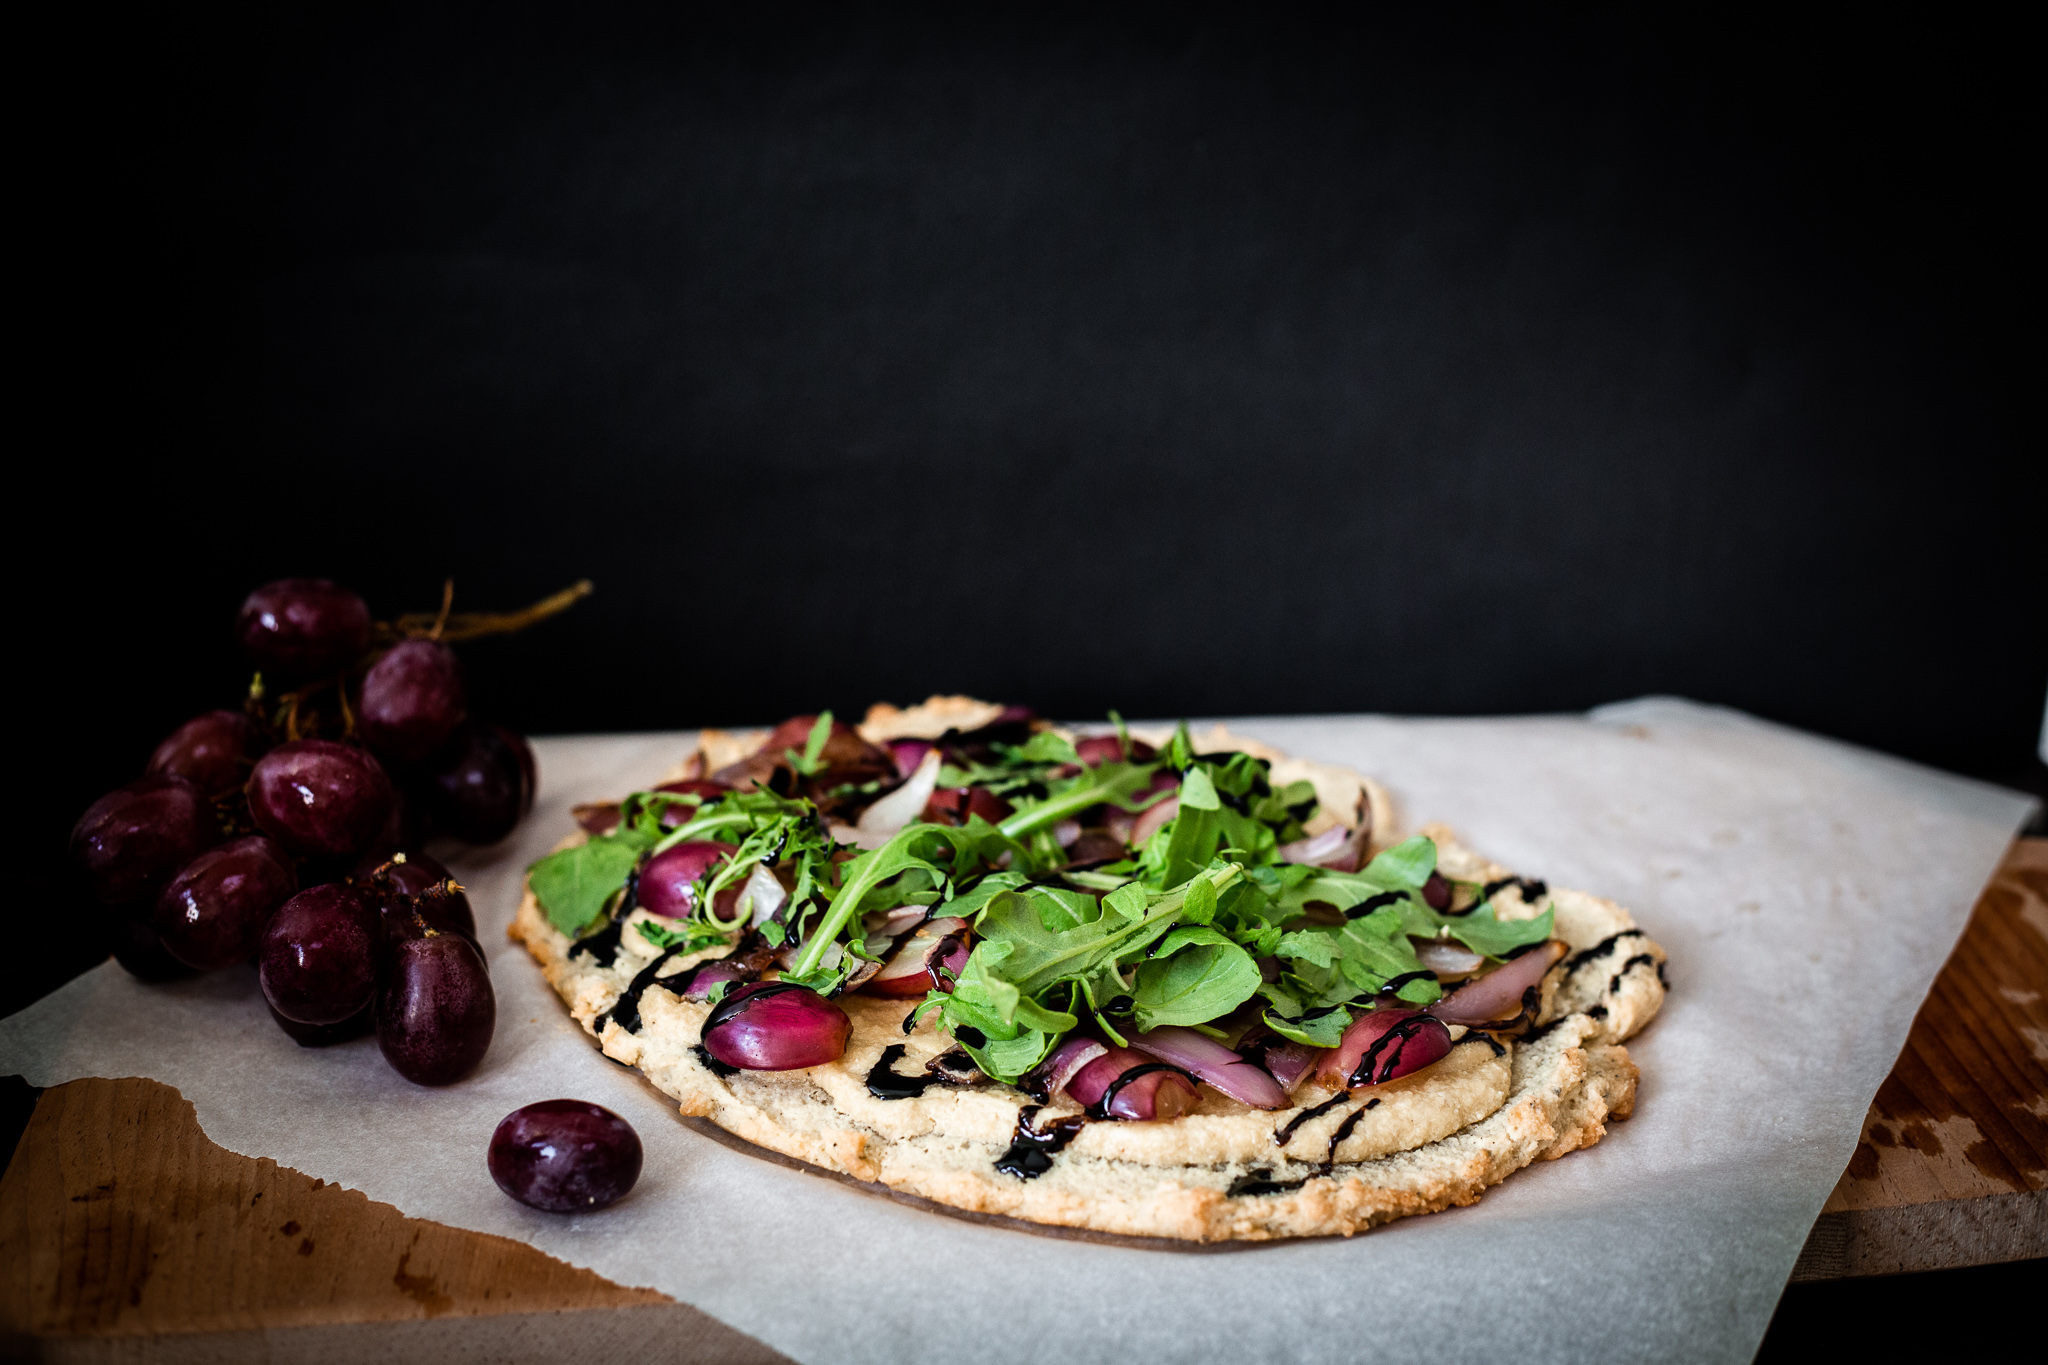 Paleo Cashew Cheese, Grape and Arugula Pizza